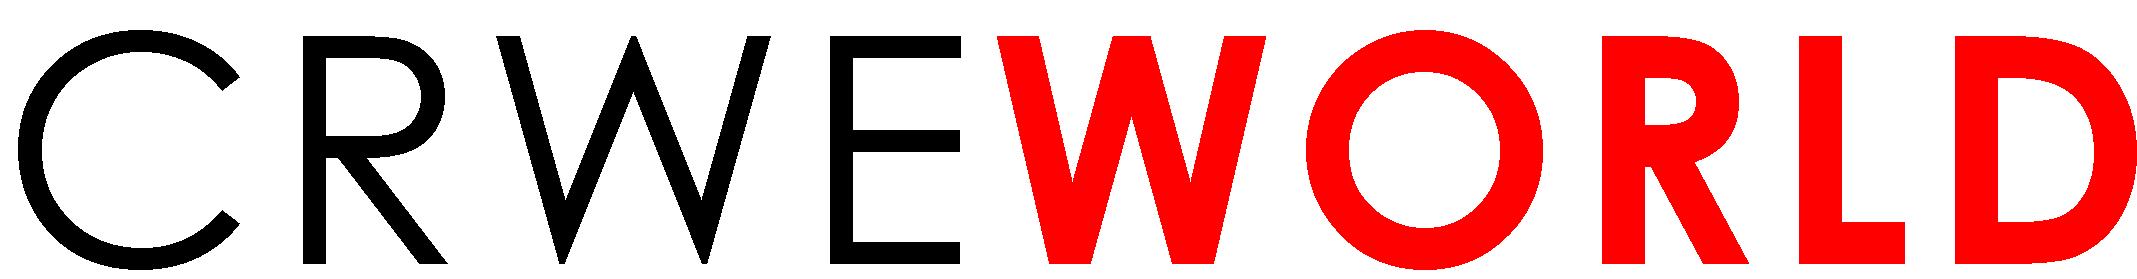 CRWEWORLD logo